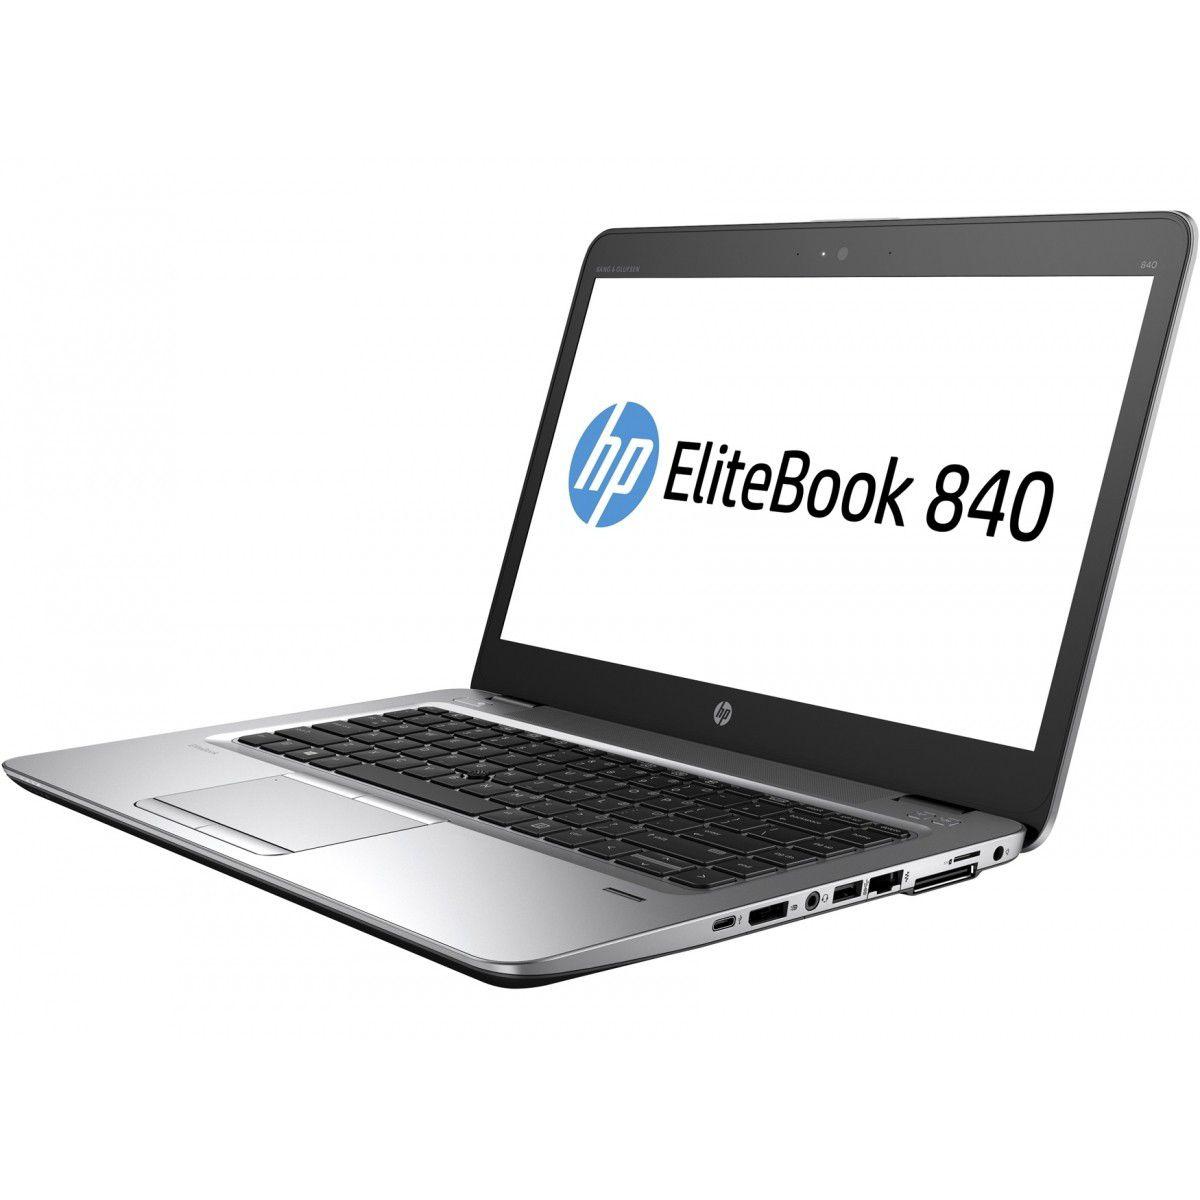 "Notebook HP ELITEBOOK 840 G3 - Intel Core i5, 4GB de memória, HD 500GB, Leitor Biometrico, Tela 14"", Windows (showroom)"